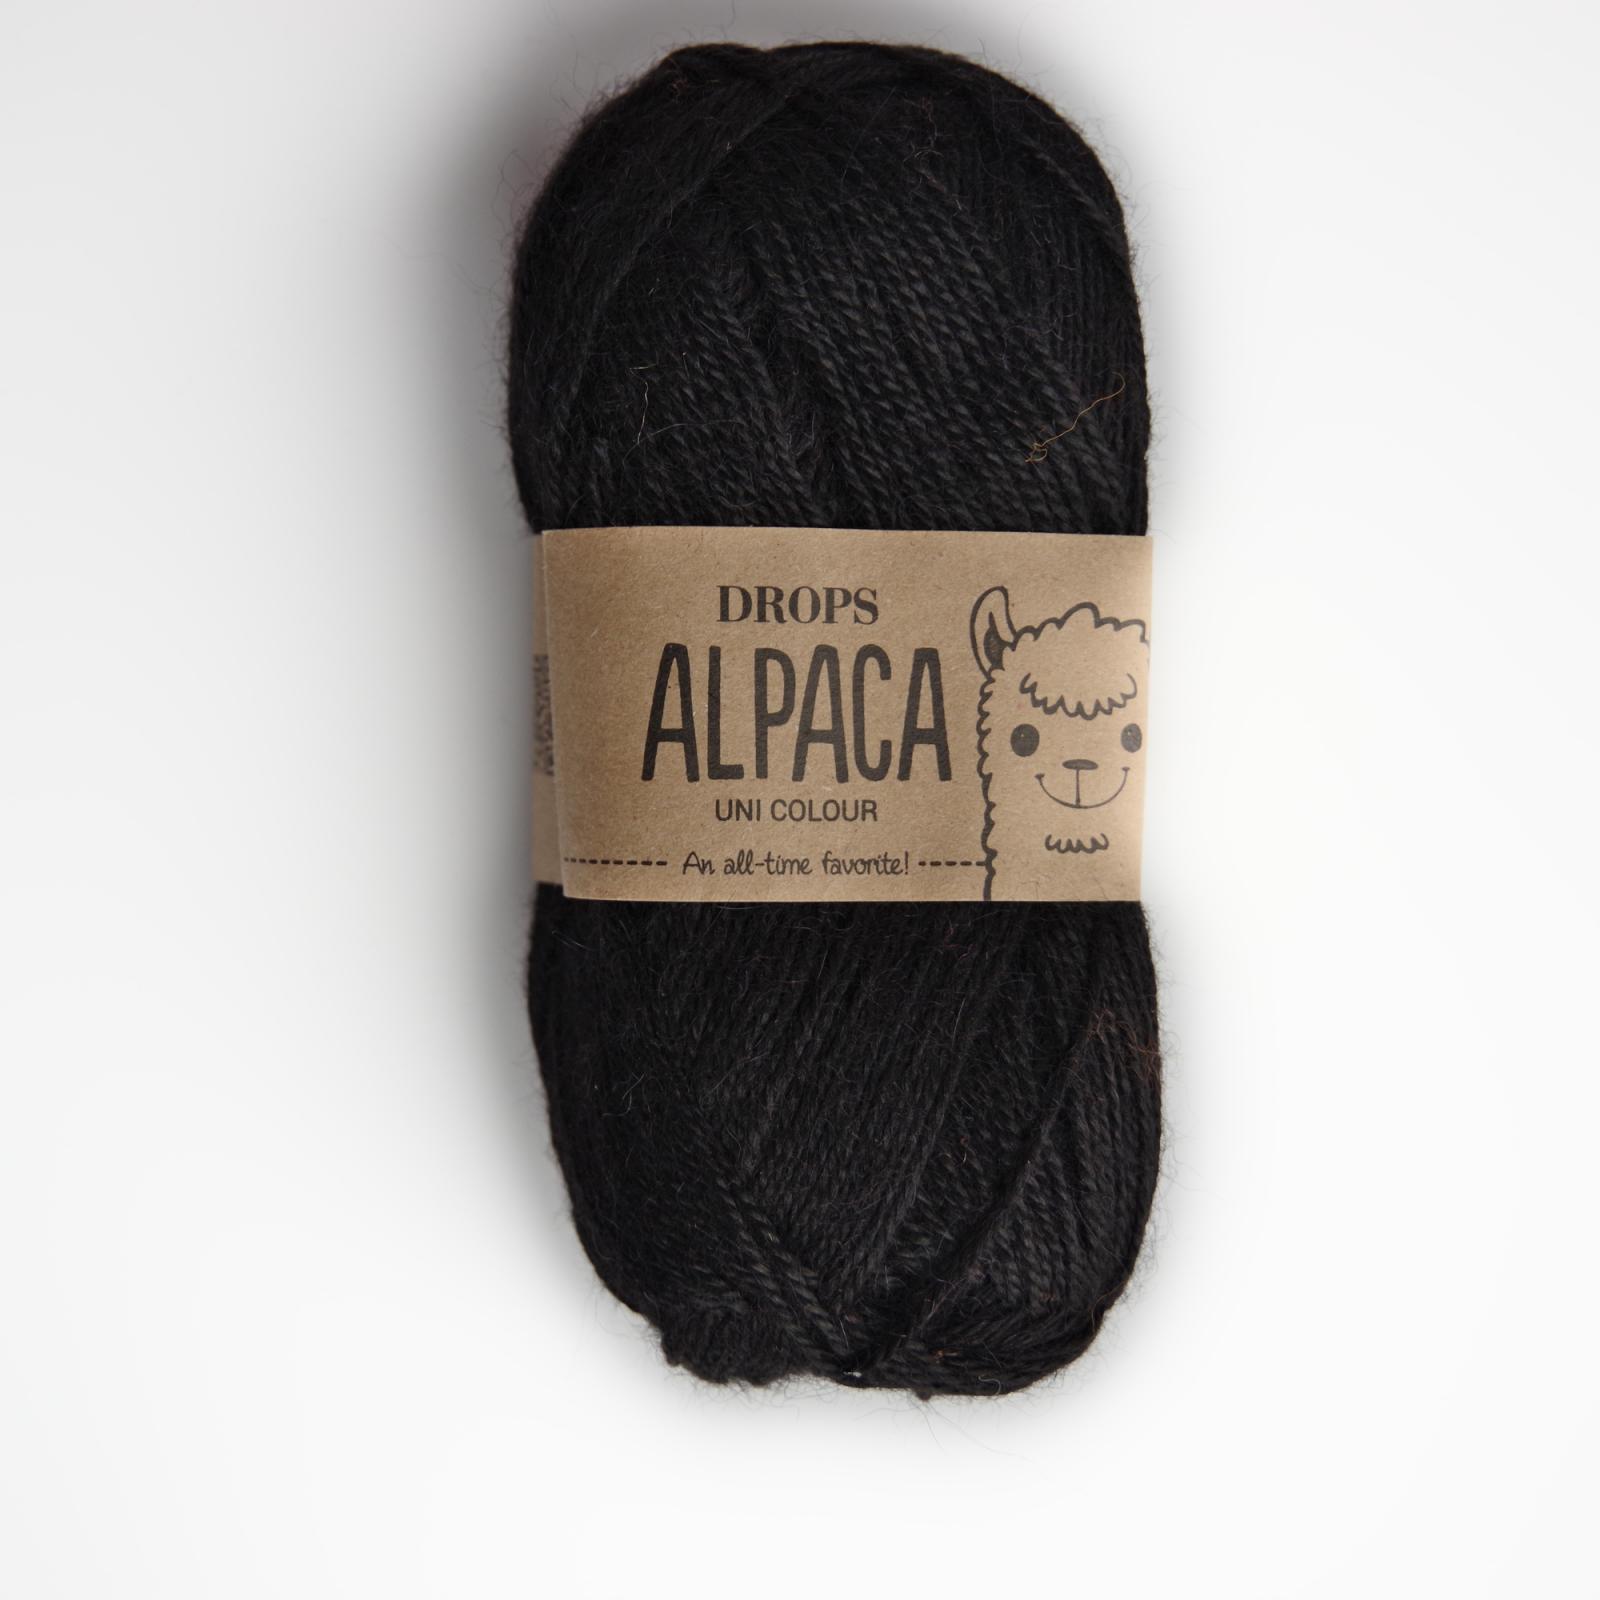 Alpaca - Uni colour - 8903 černá